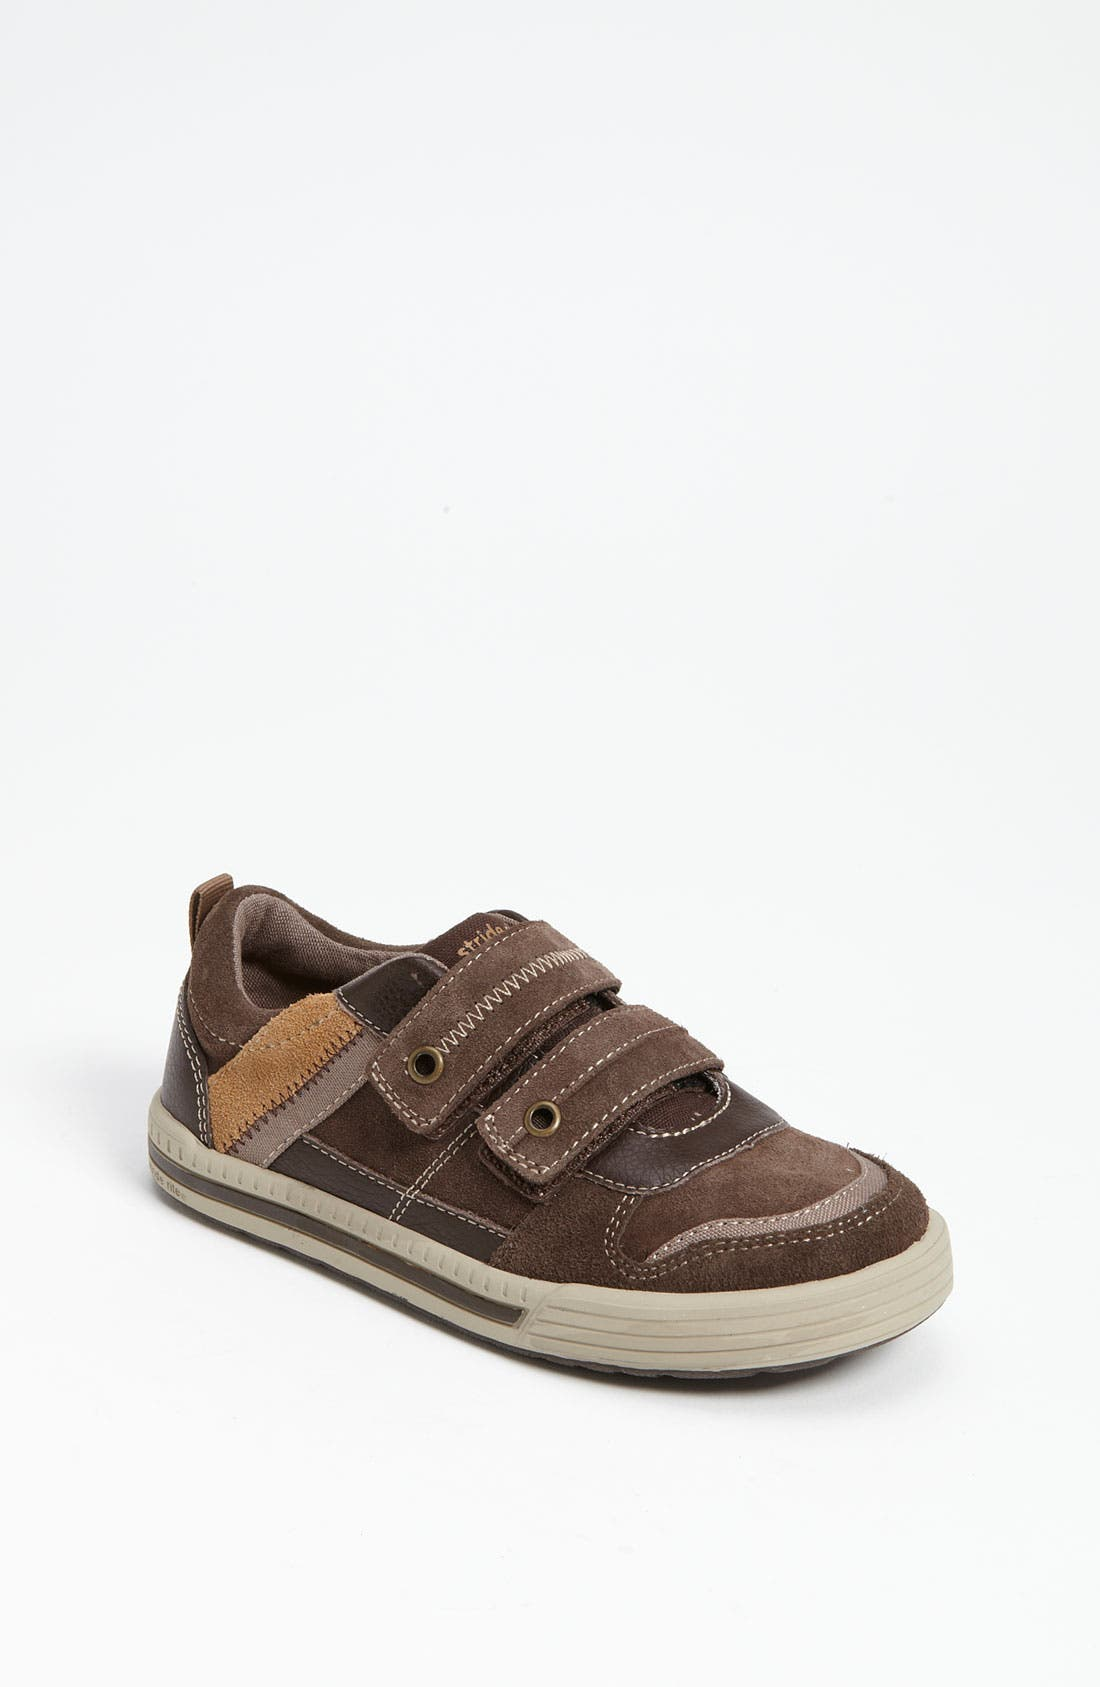 Main Image - Stride Rite 'Tex' Sneaker (Toddler)